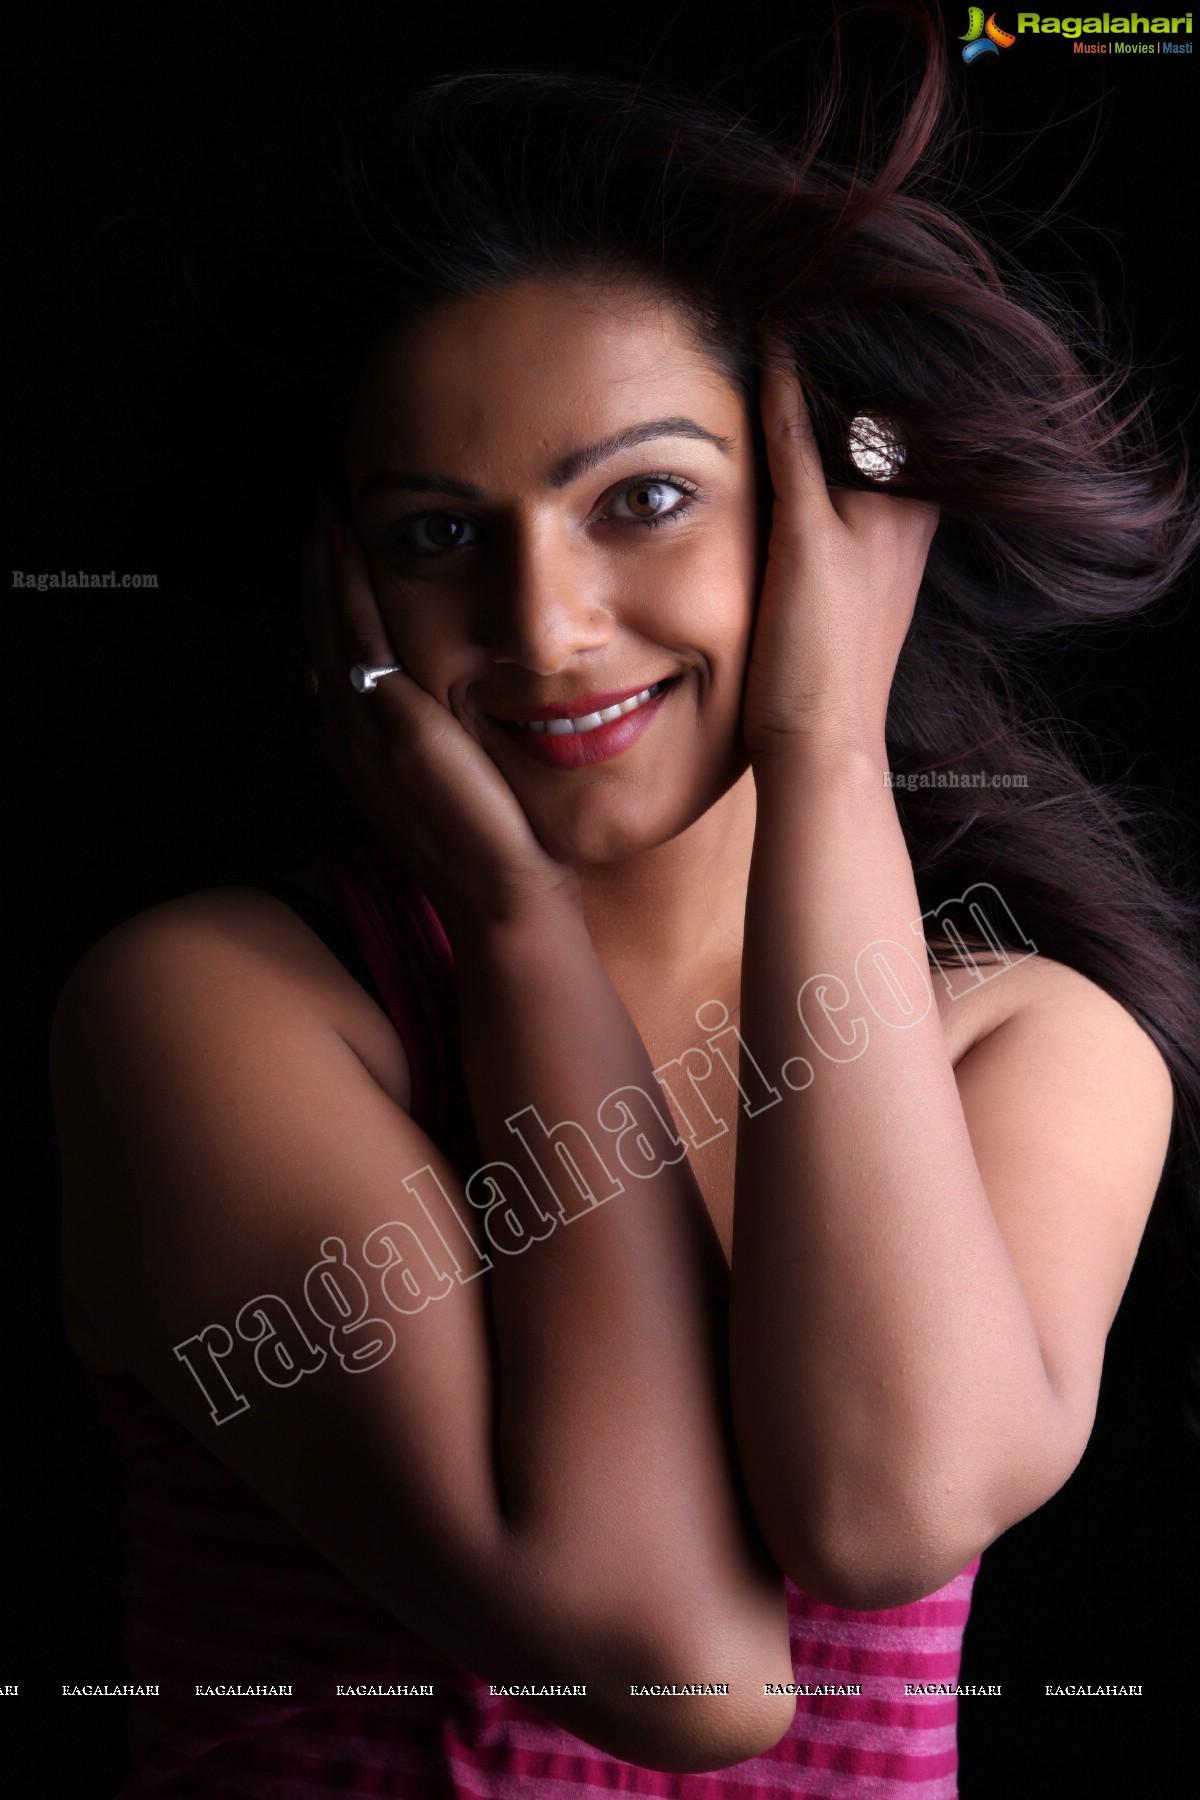 anjali dwivedi image 70 | tollywood heroines wallpapers ,telugu